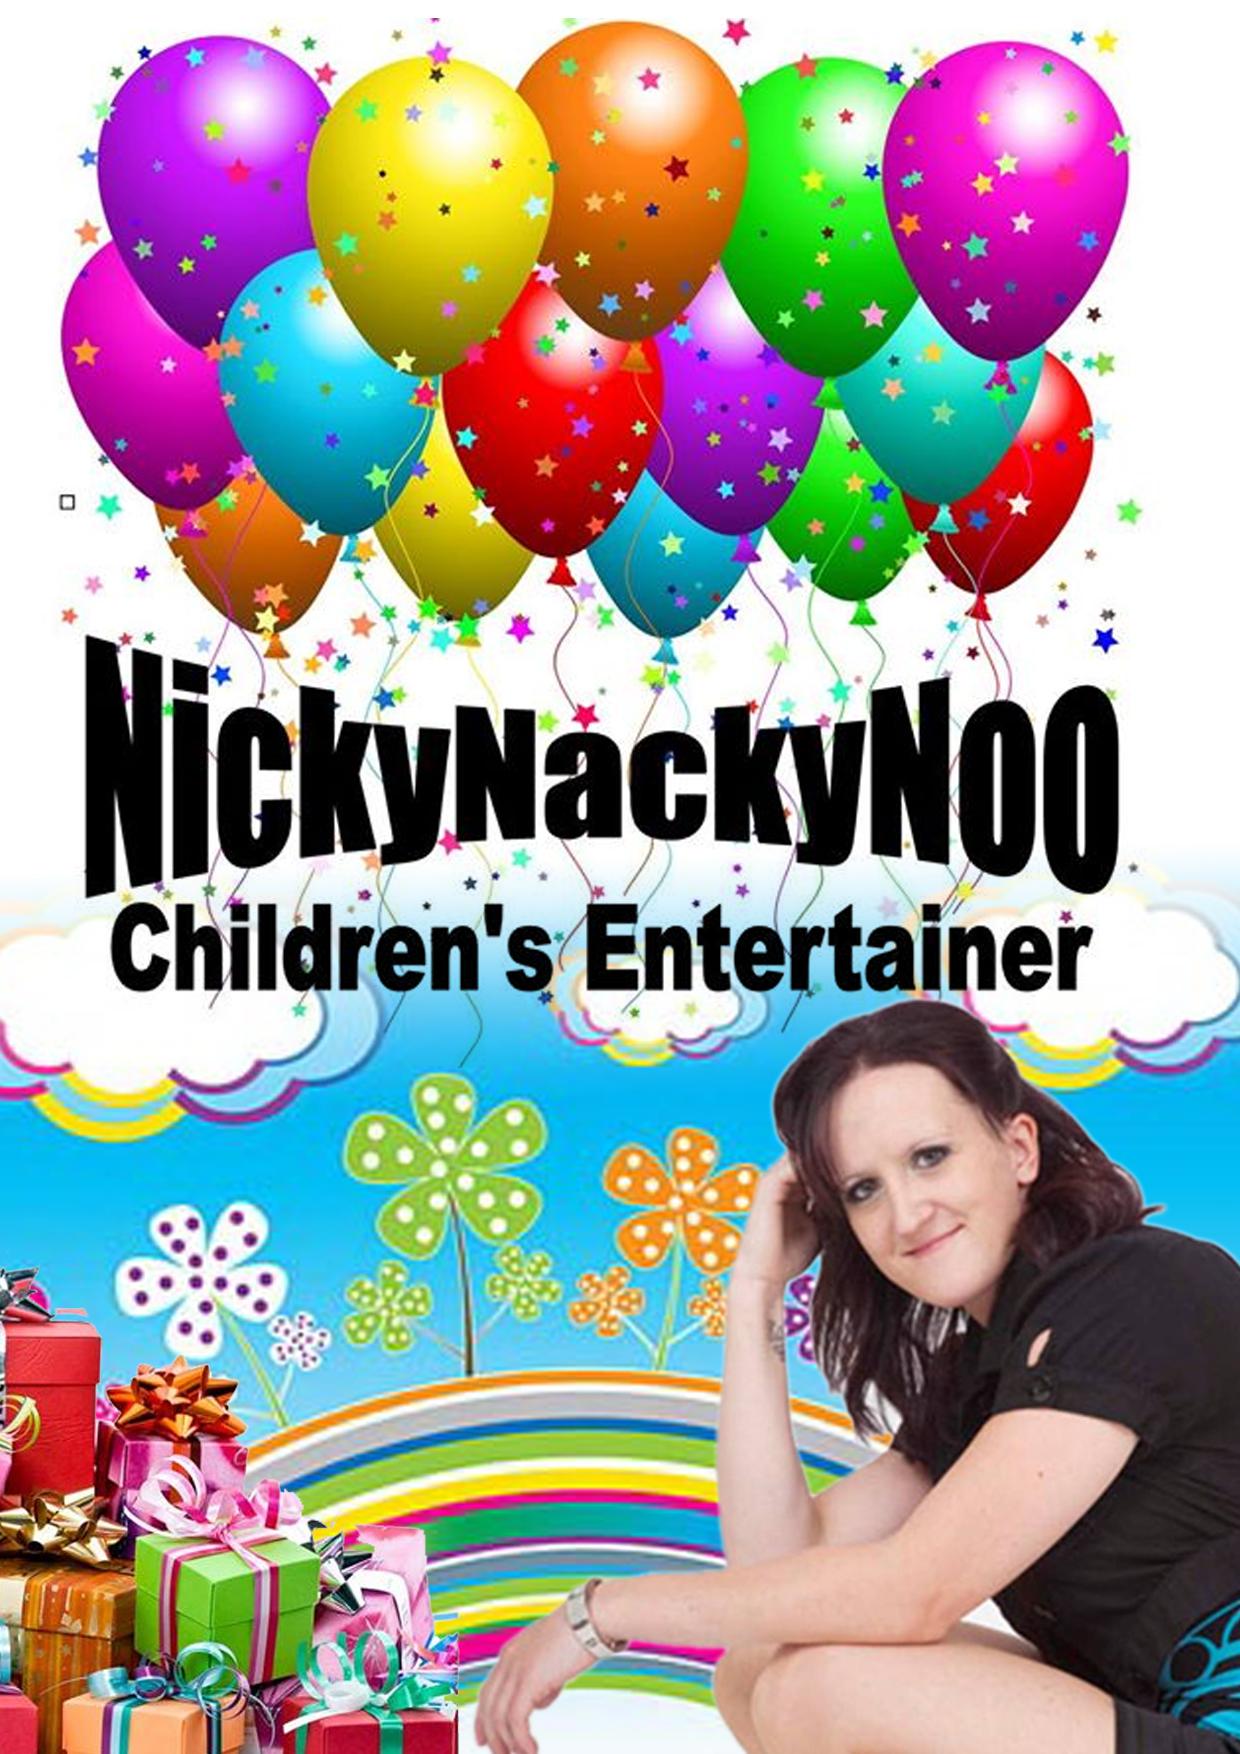 Nickynackynoo